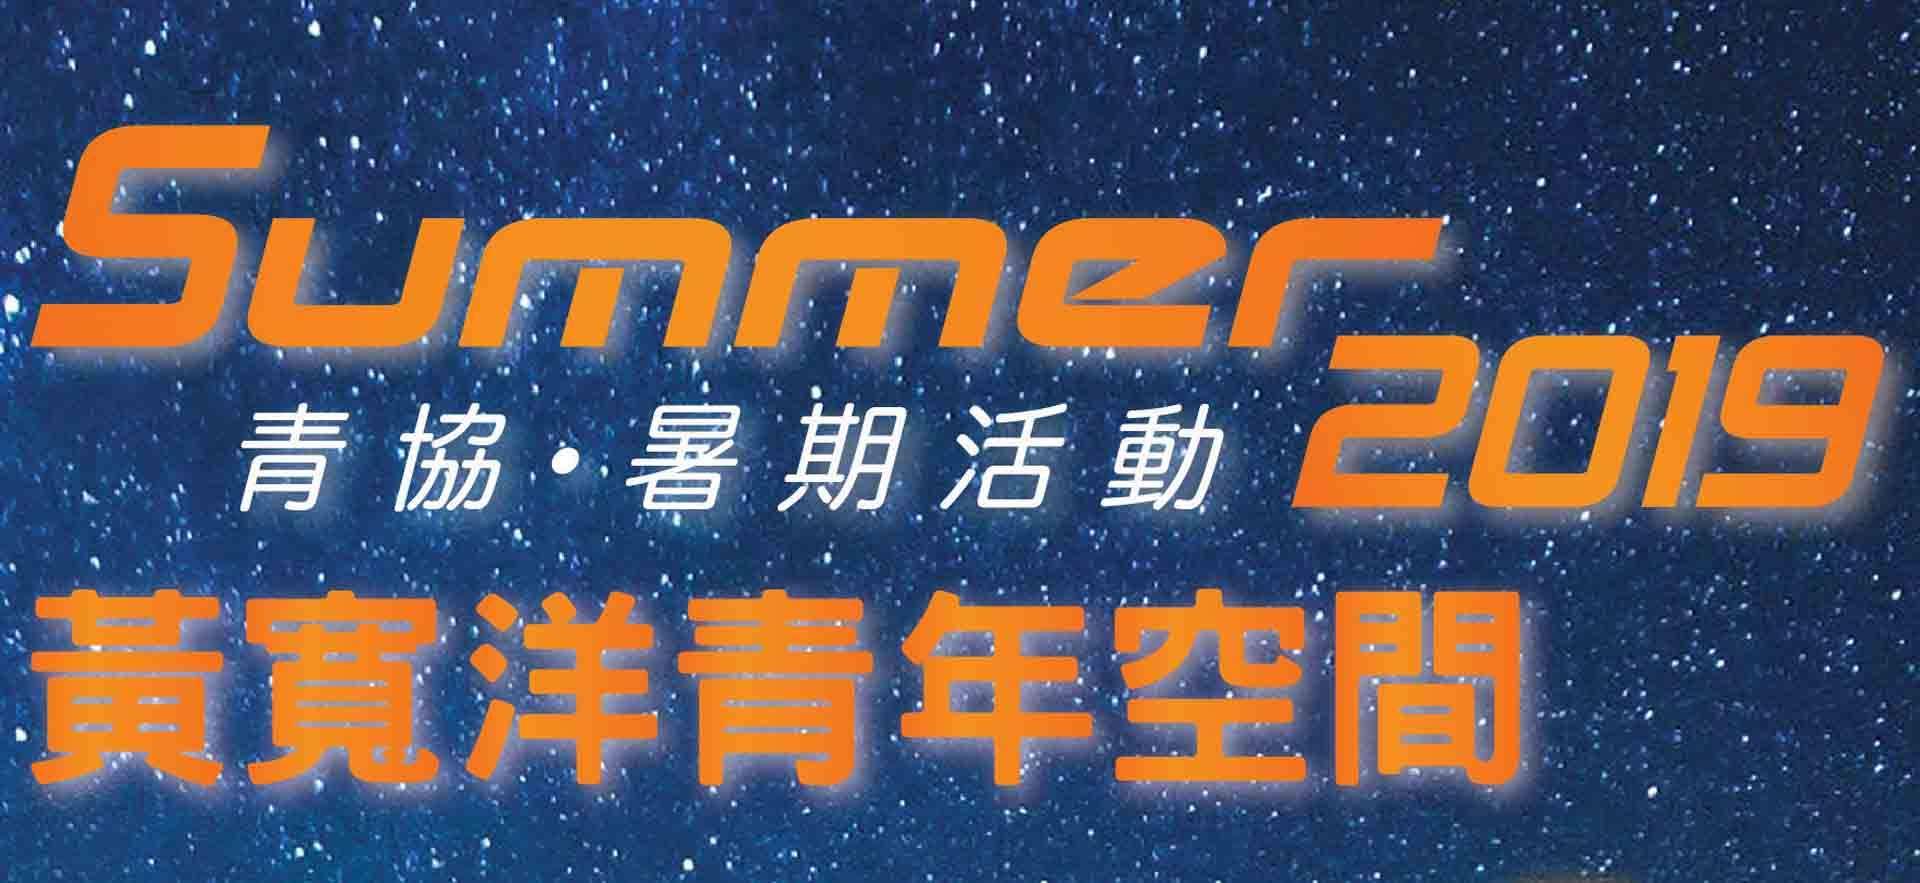 web_banner_syp2019